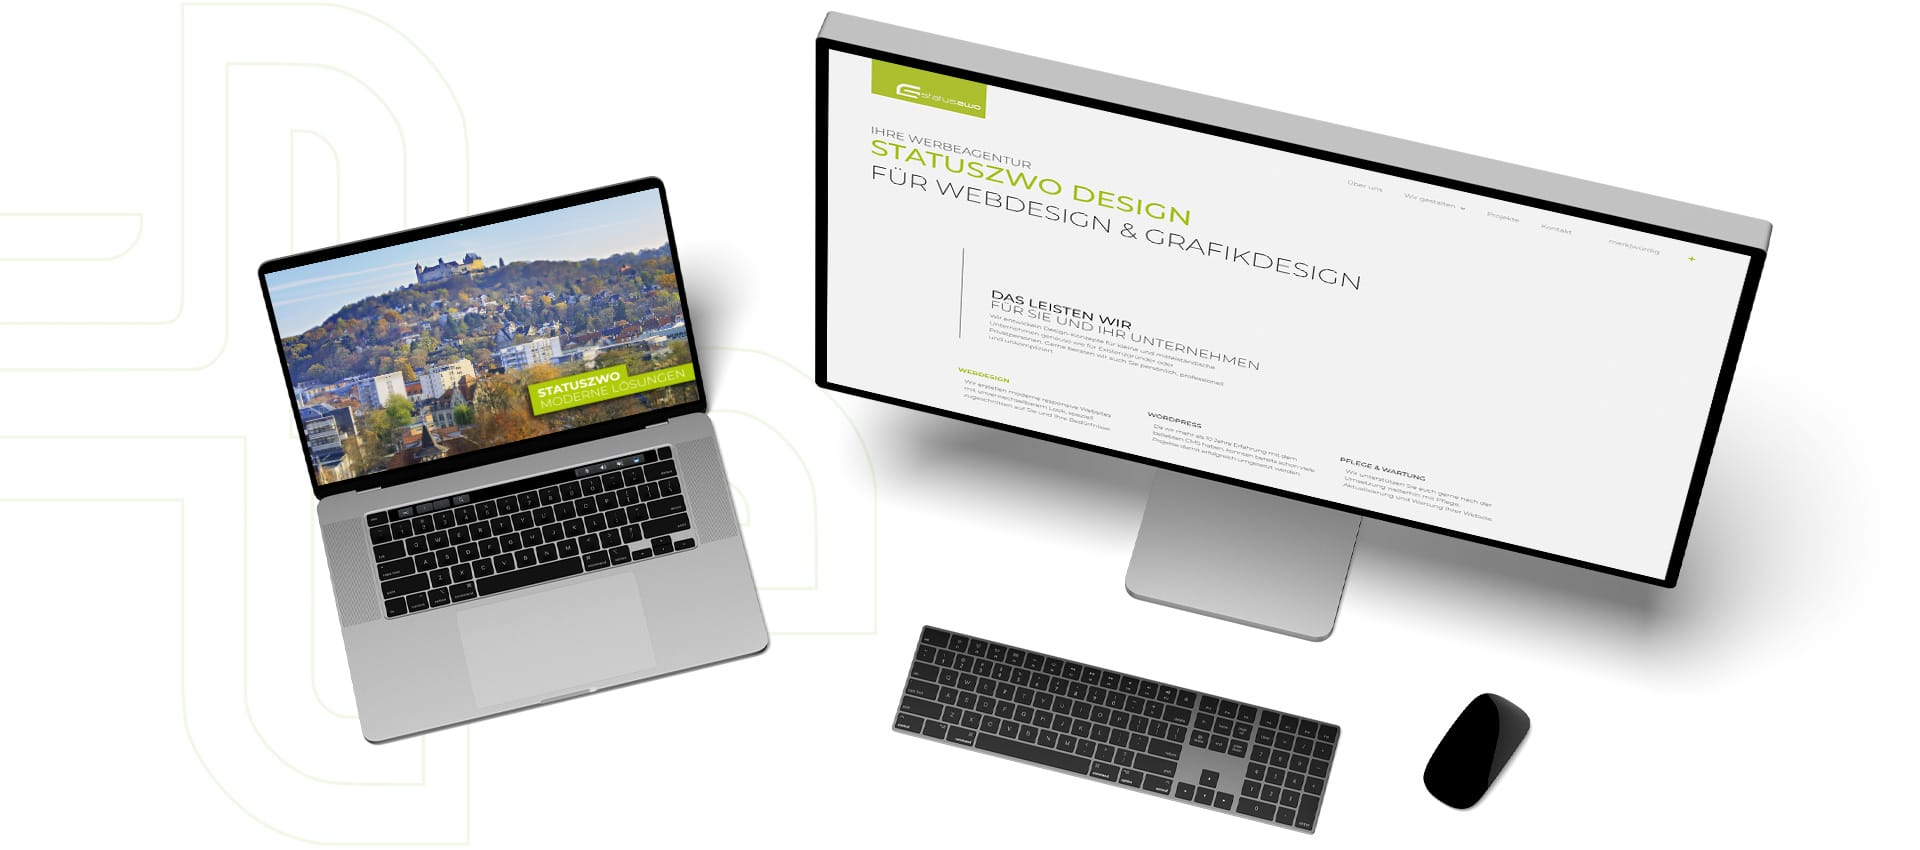 Webdesign Coburg Werbeagentur